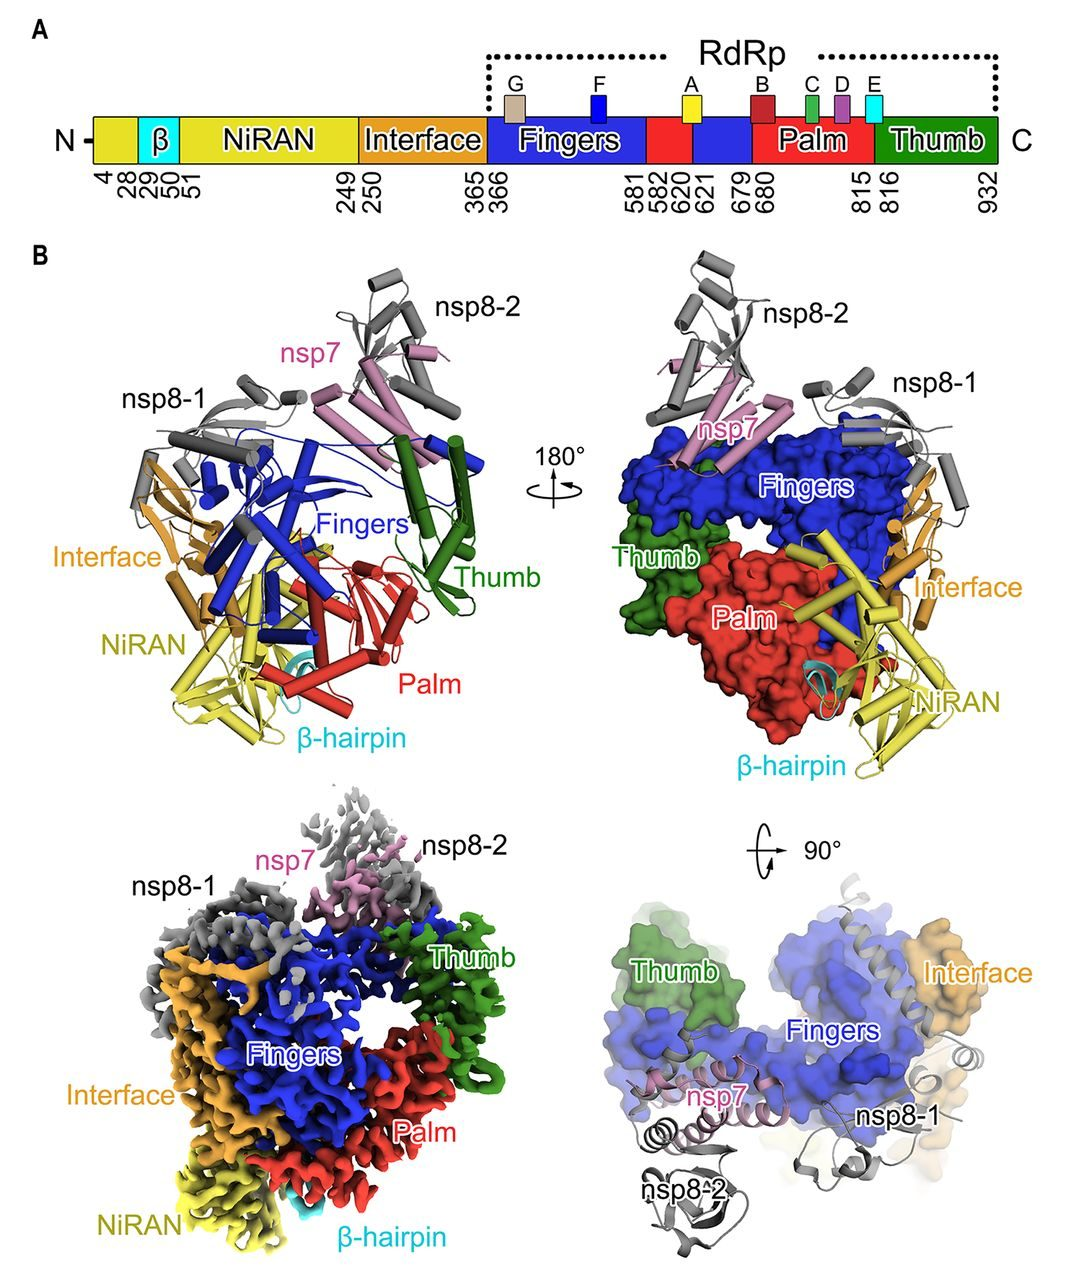 Figura 1. Struttura della Rna–polimerasi Rna–dipendente (complesso nsp12–nsp7–nsp8) di Sars–Cov–2 / Science